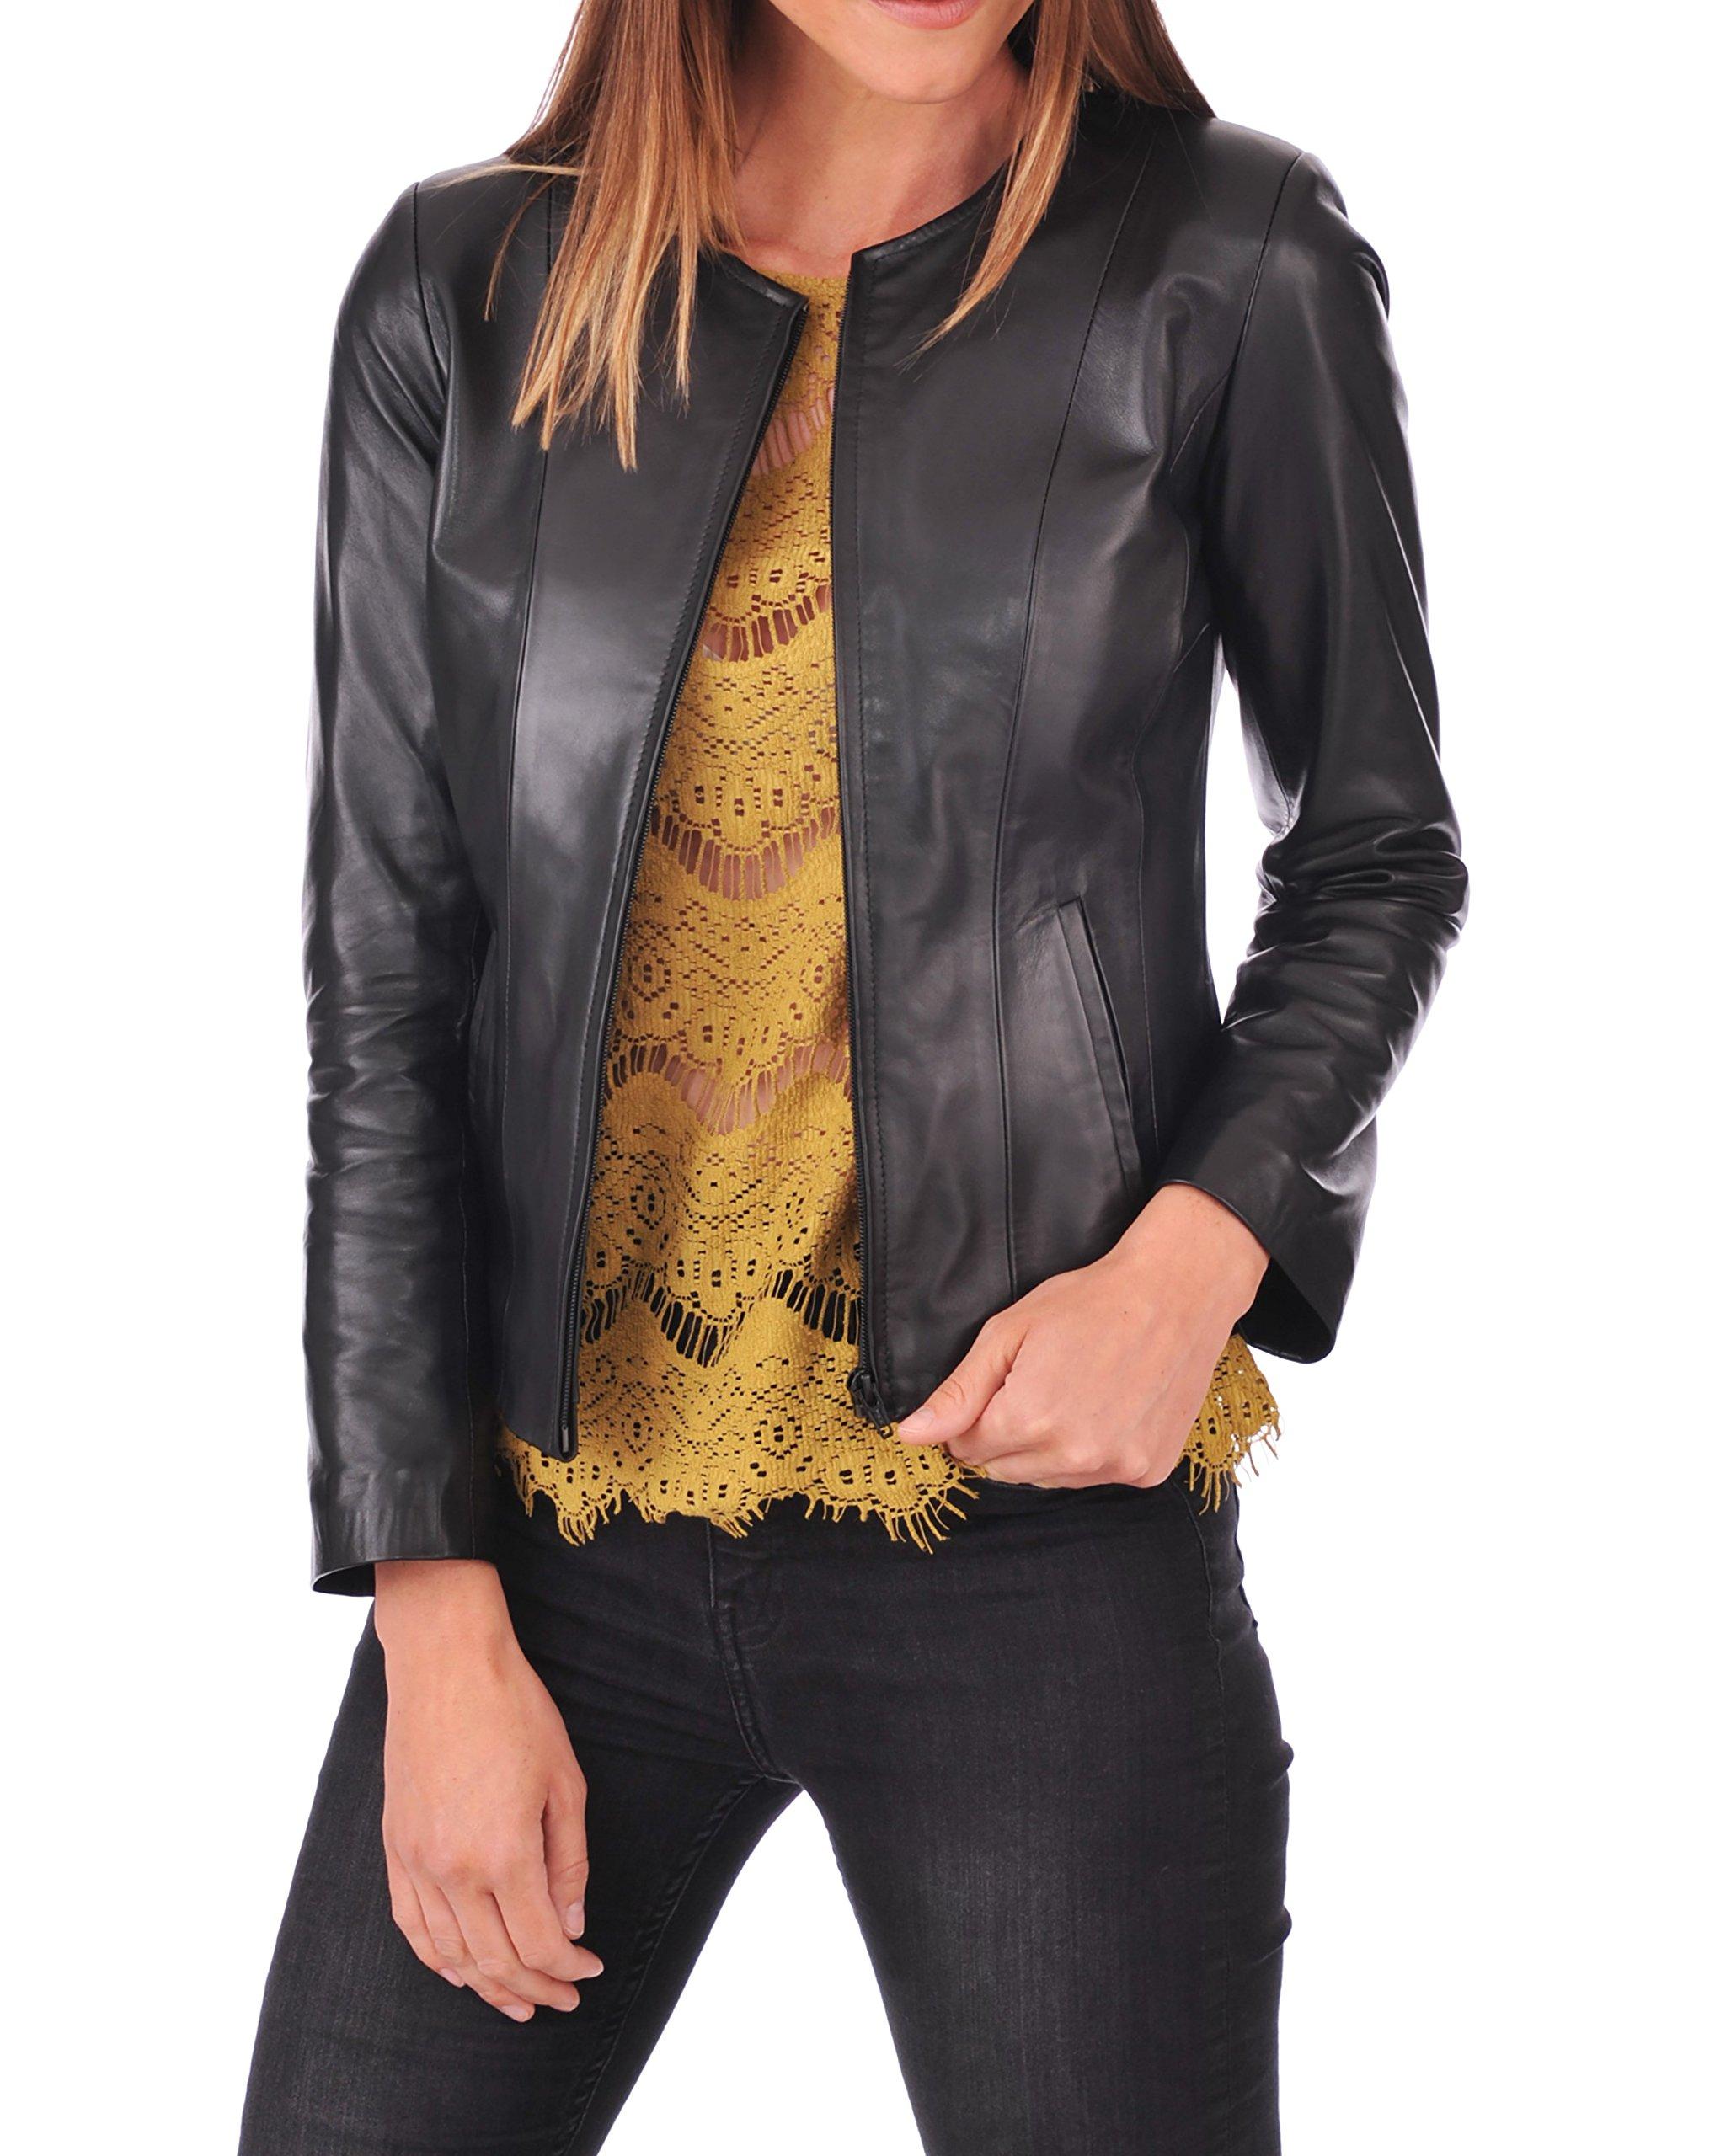 Womens Leather Jacket Lambskin Genuine Womens Biker Jacket Black XS to XXL by DOLLY LAMB